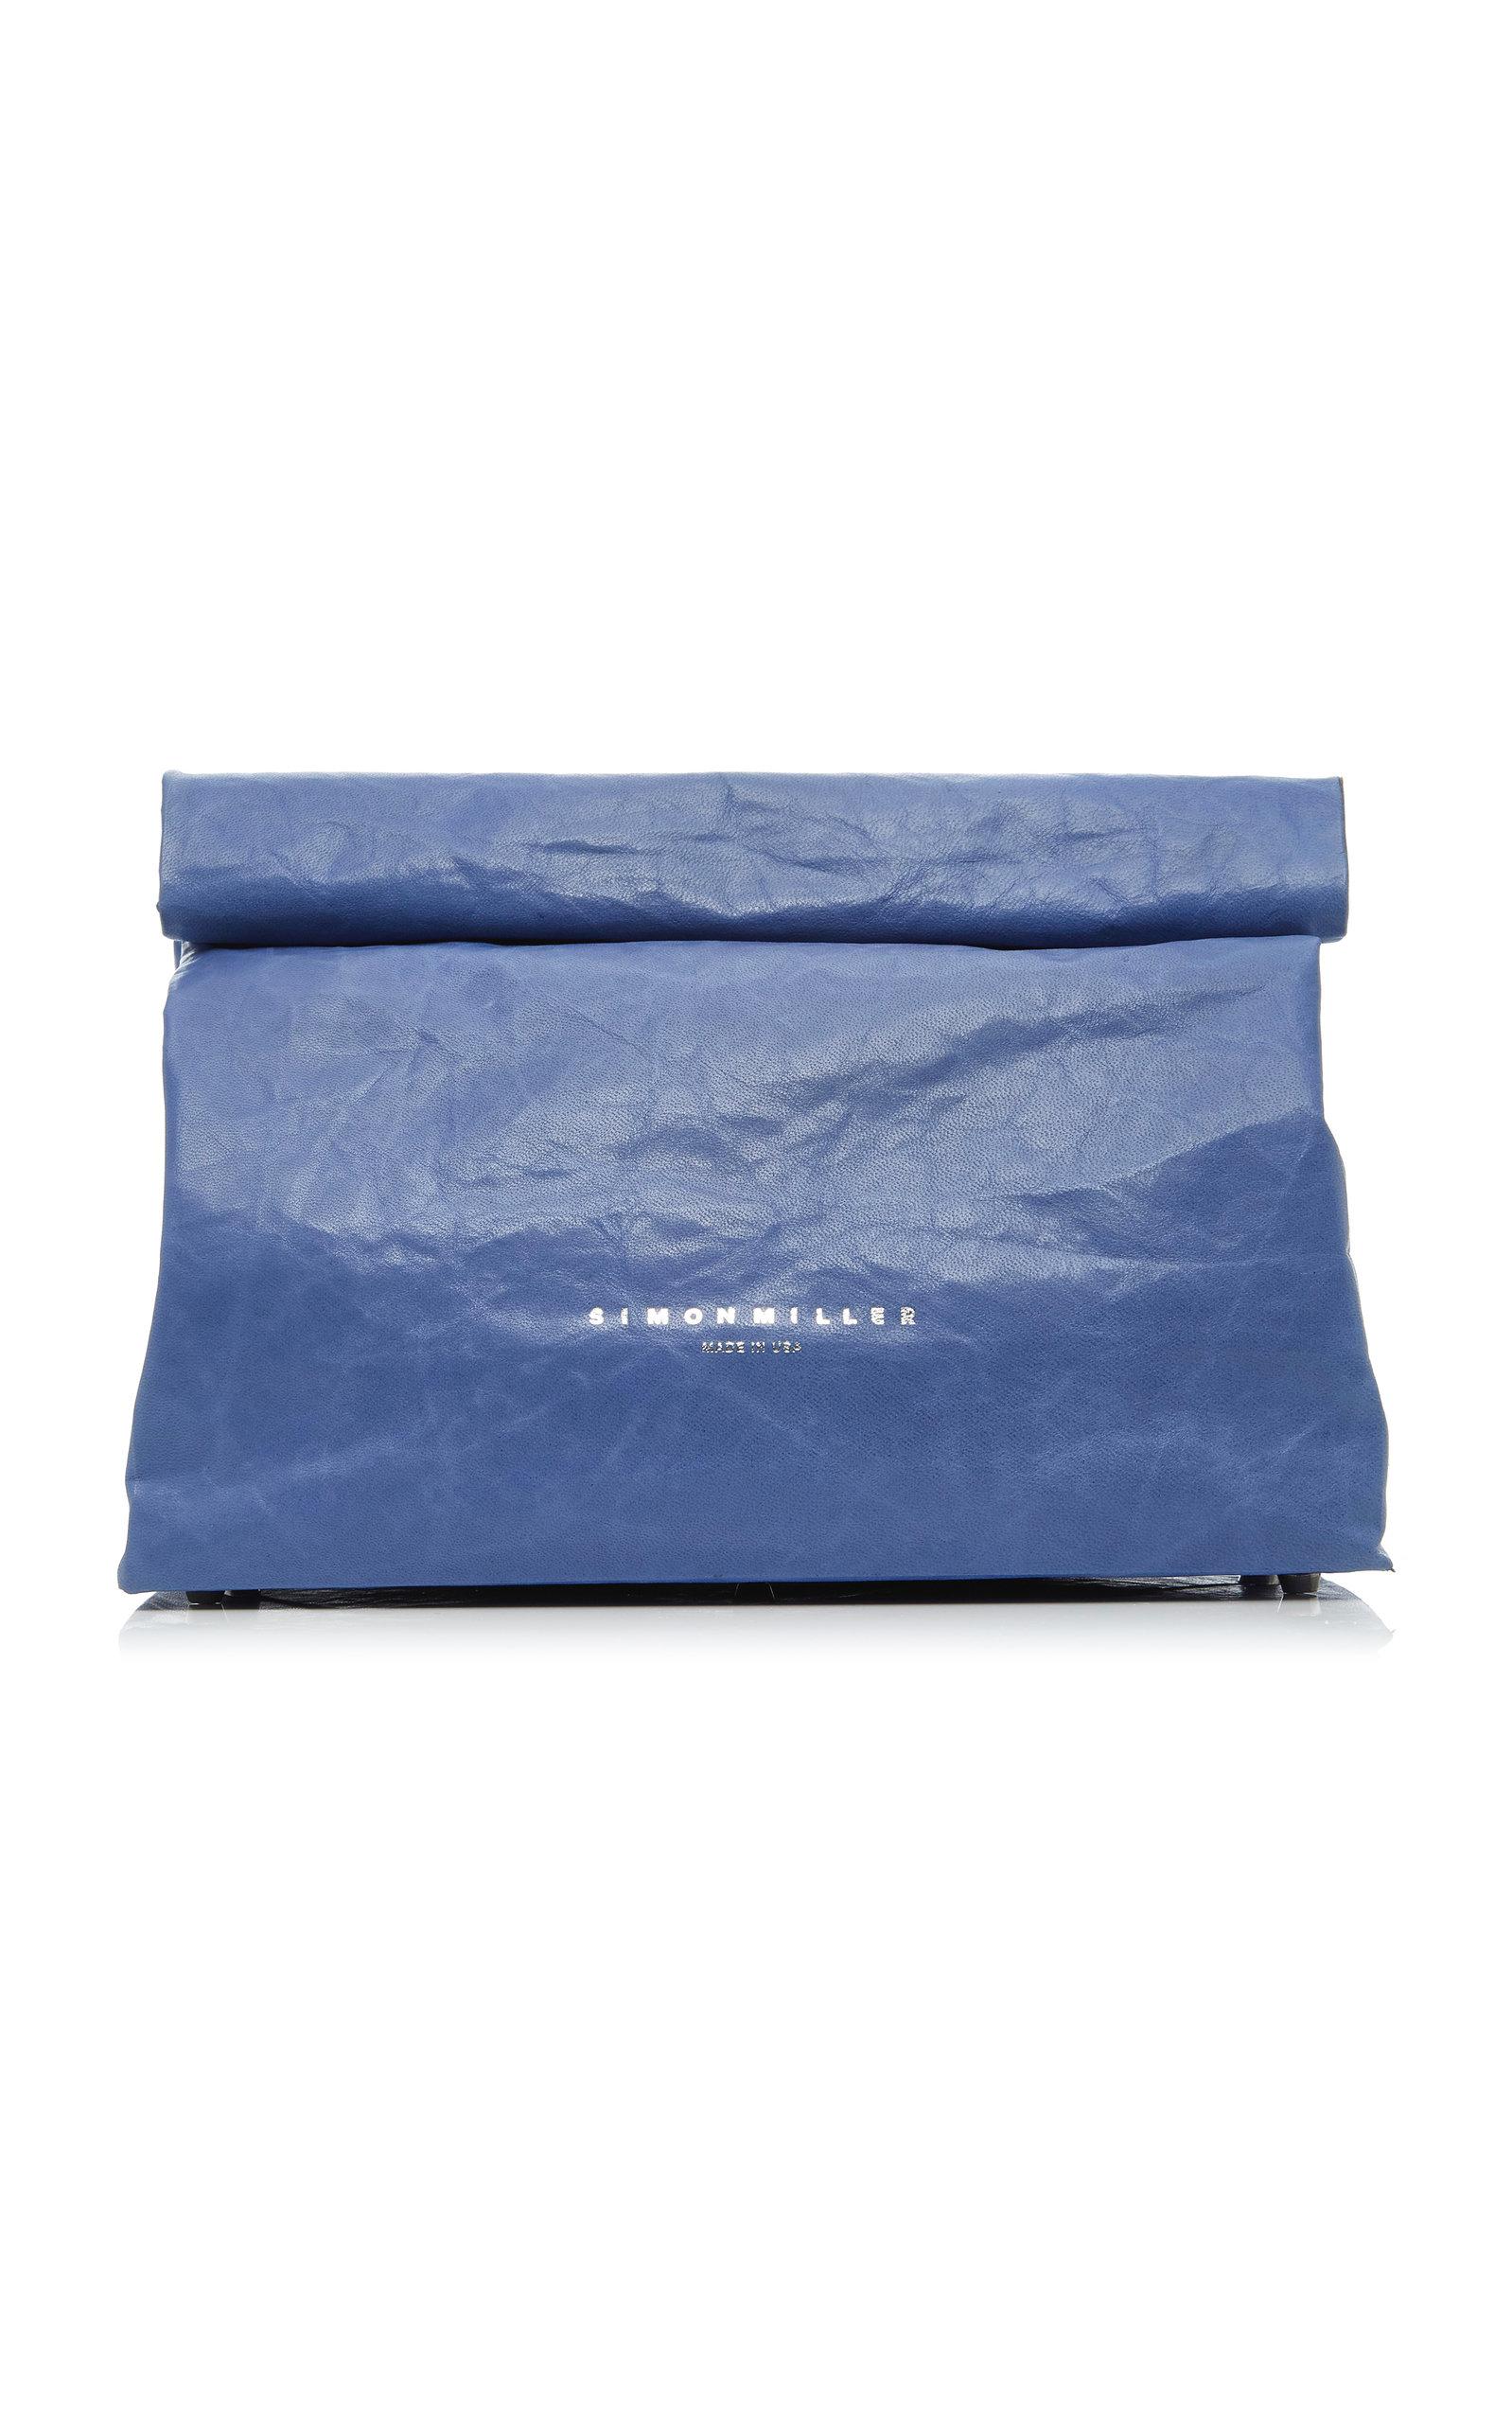 Lunchbag Clutch 30Cm Simon Miller A7UWOxkk5